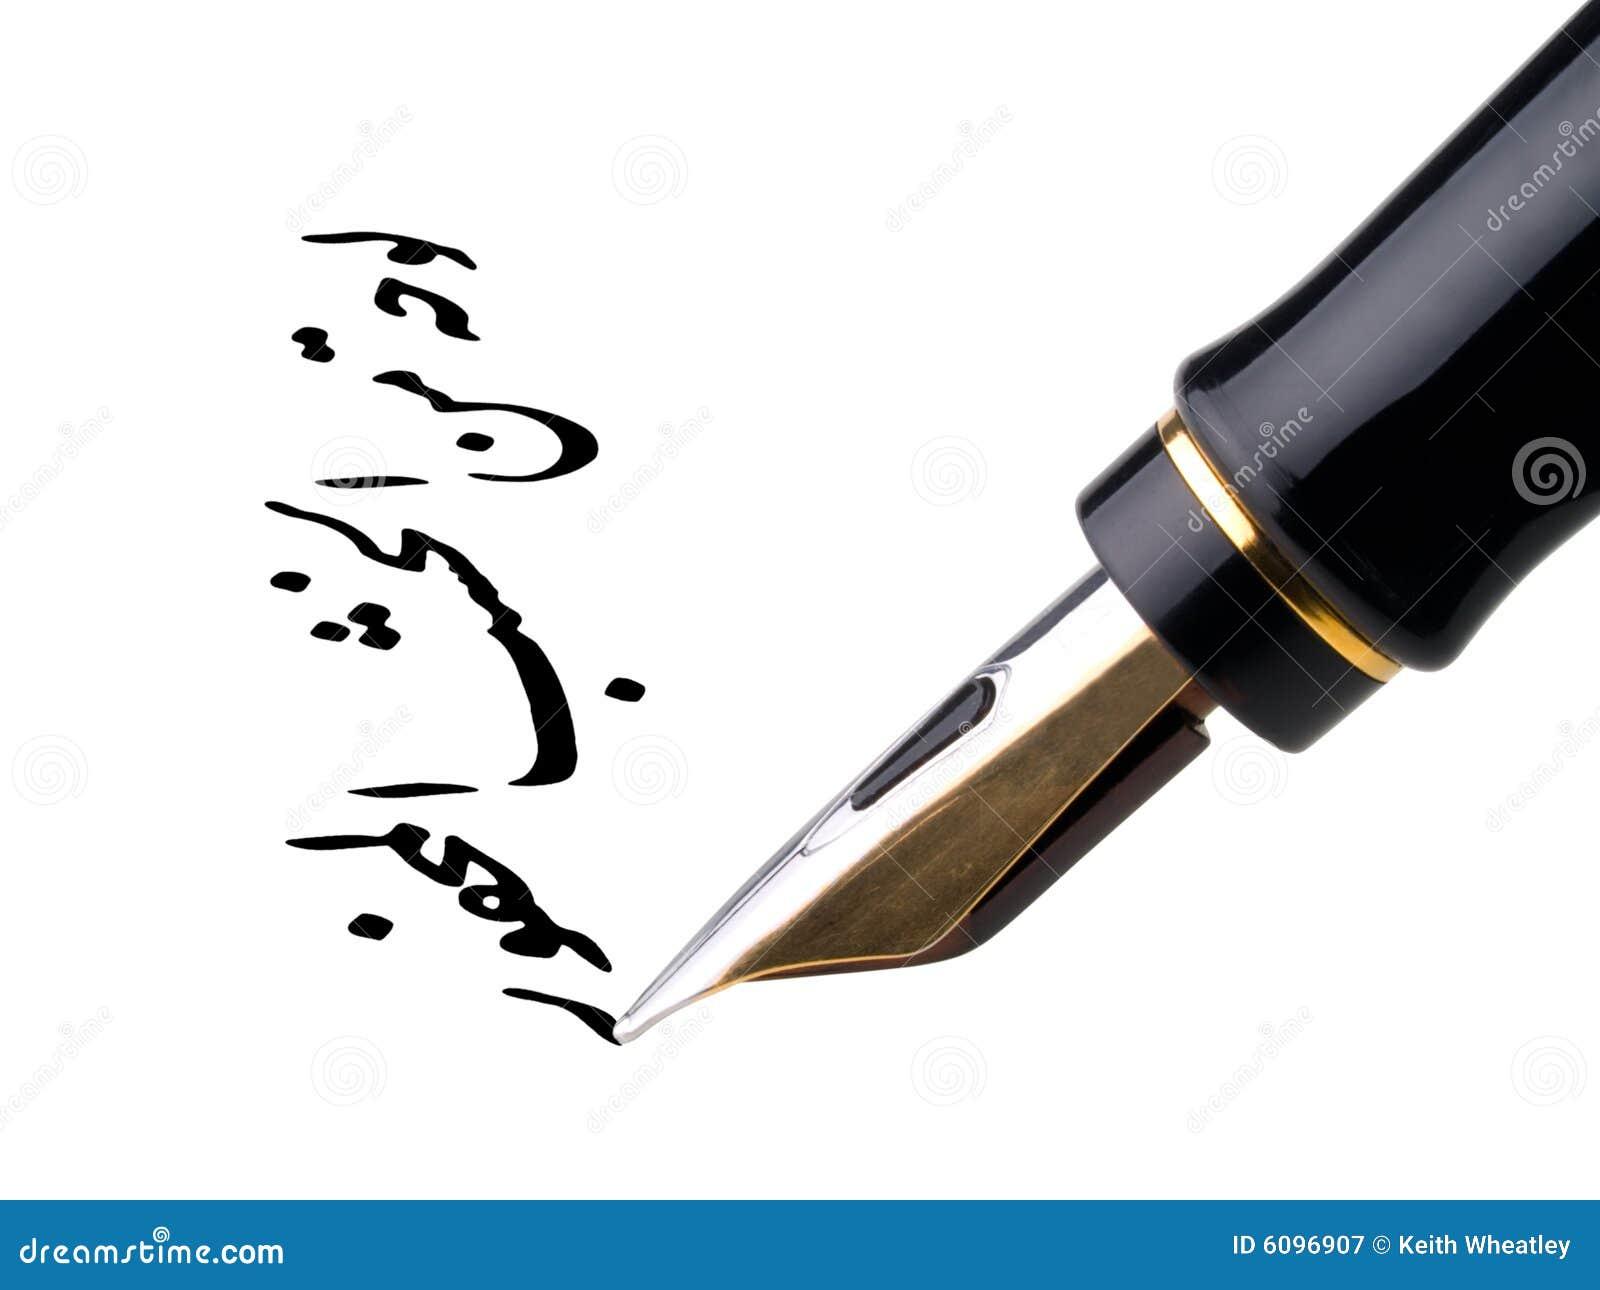 Fountain Pen Nib Writing In Arabic Royalty Free Stock Photography ...